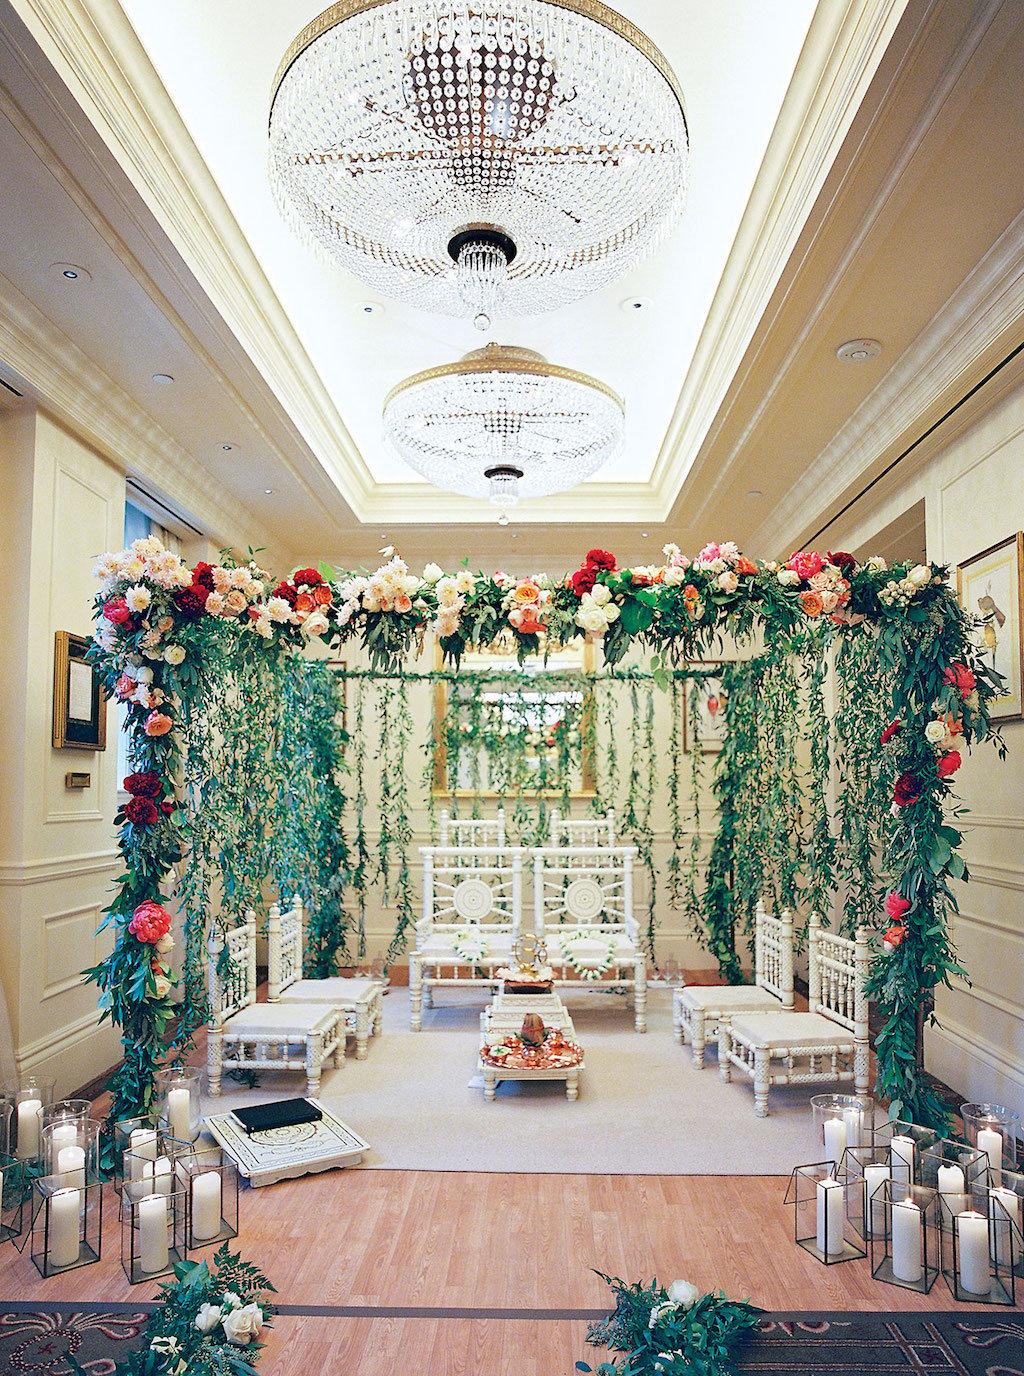 10-11-16-coolest-wedding-decor-design-4